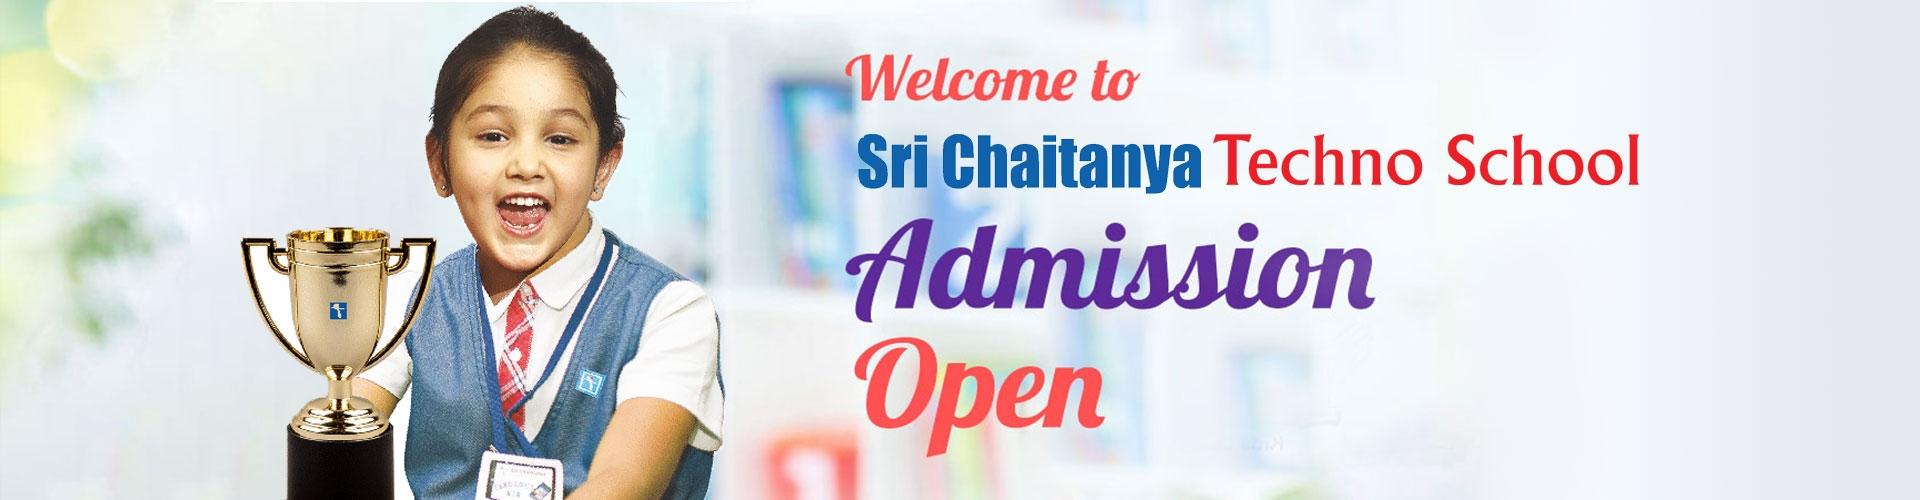 Sri Chaitanya School Jaipur  (@srichaitanya) Cover Image